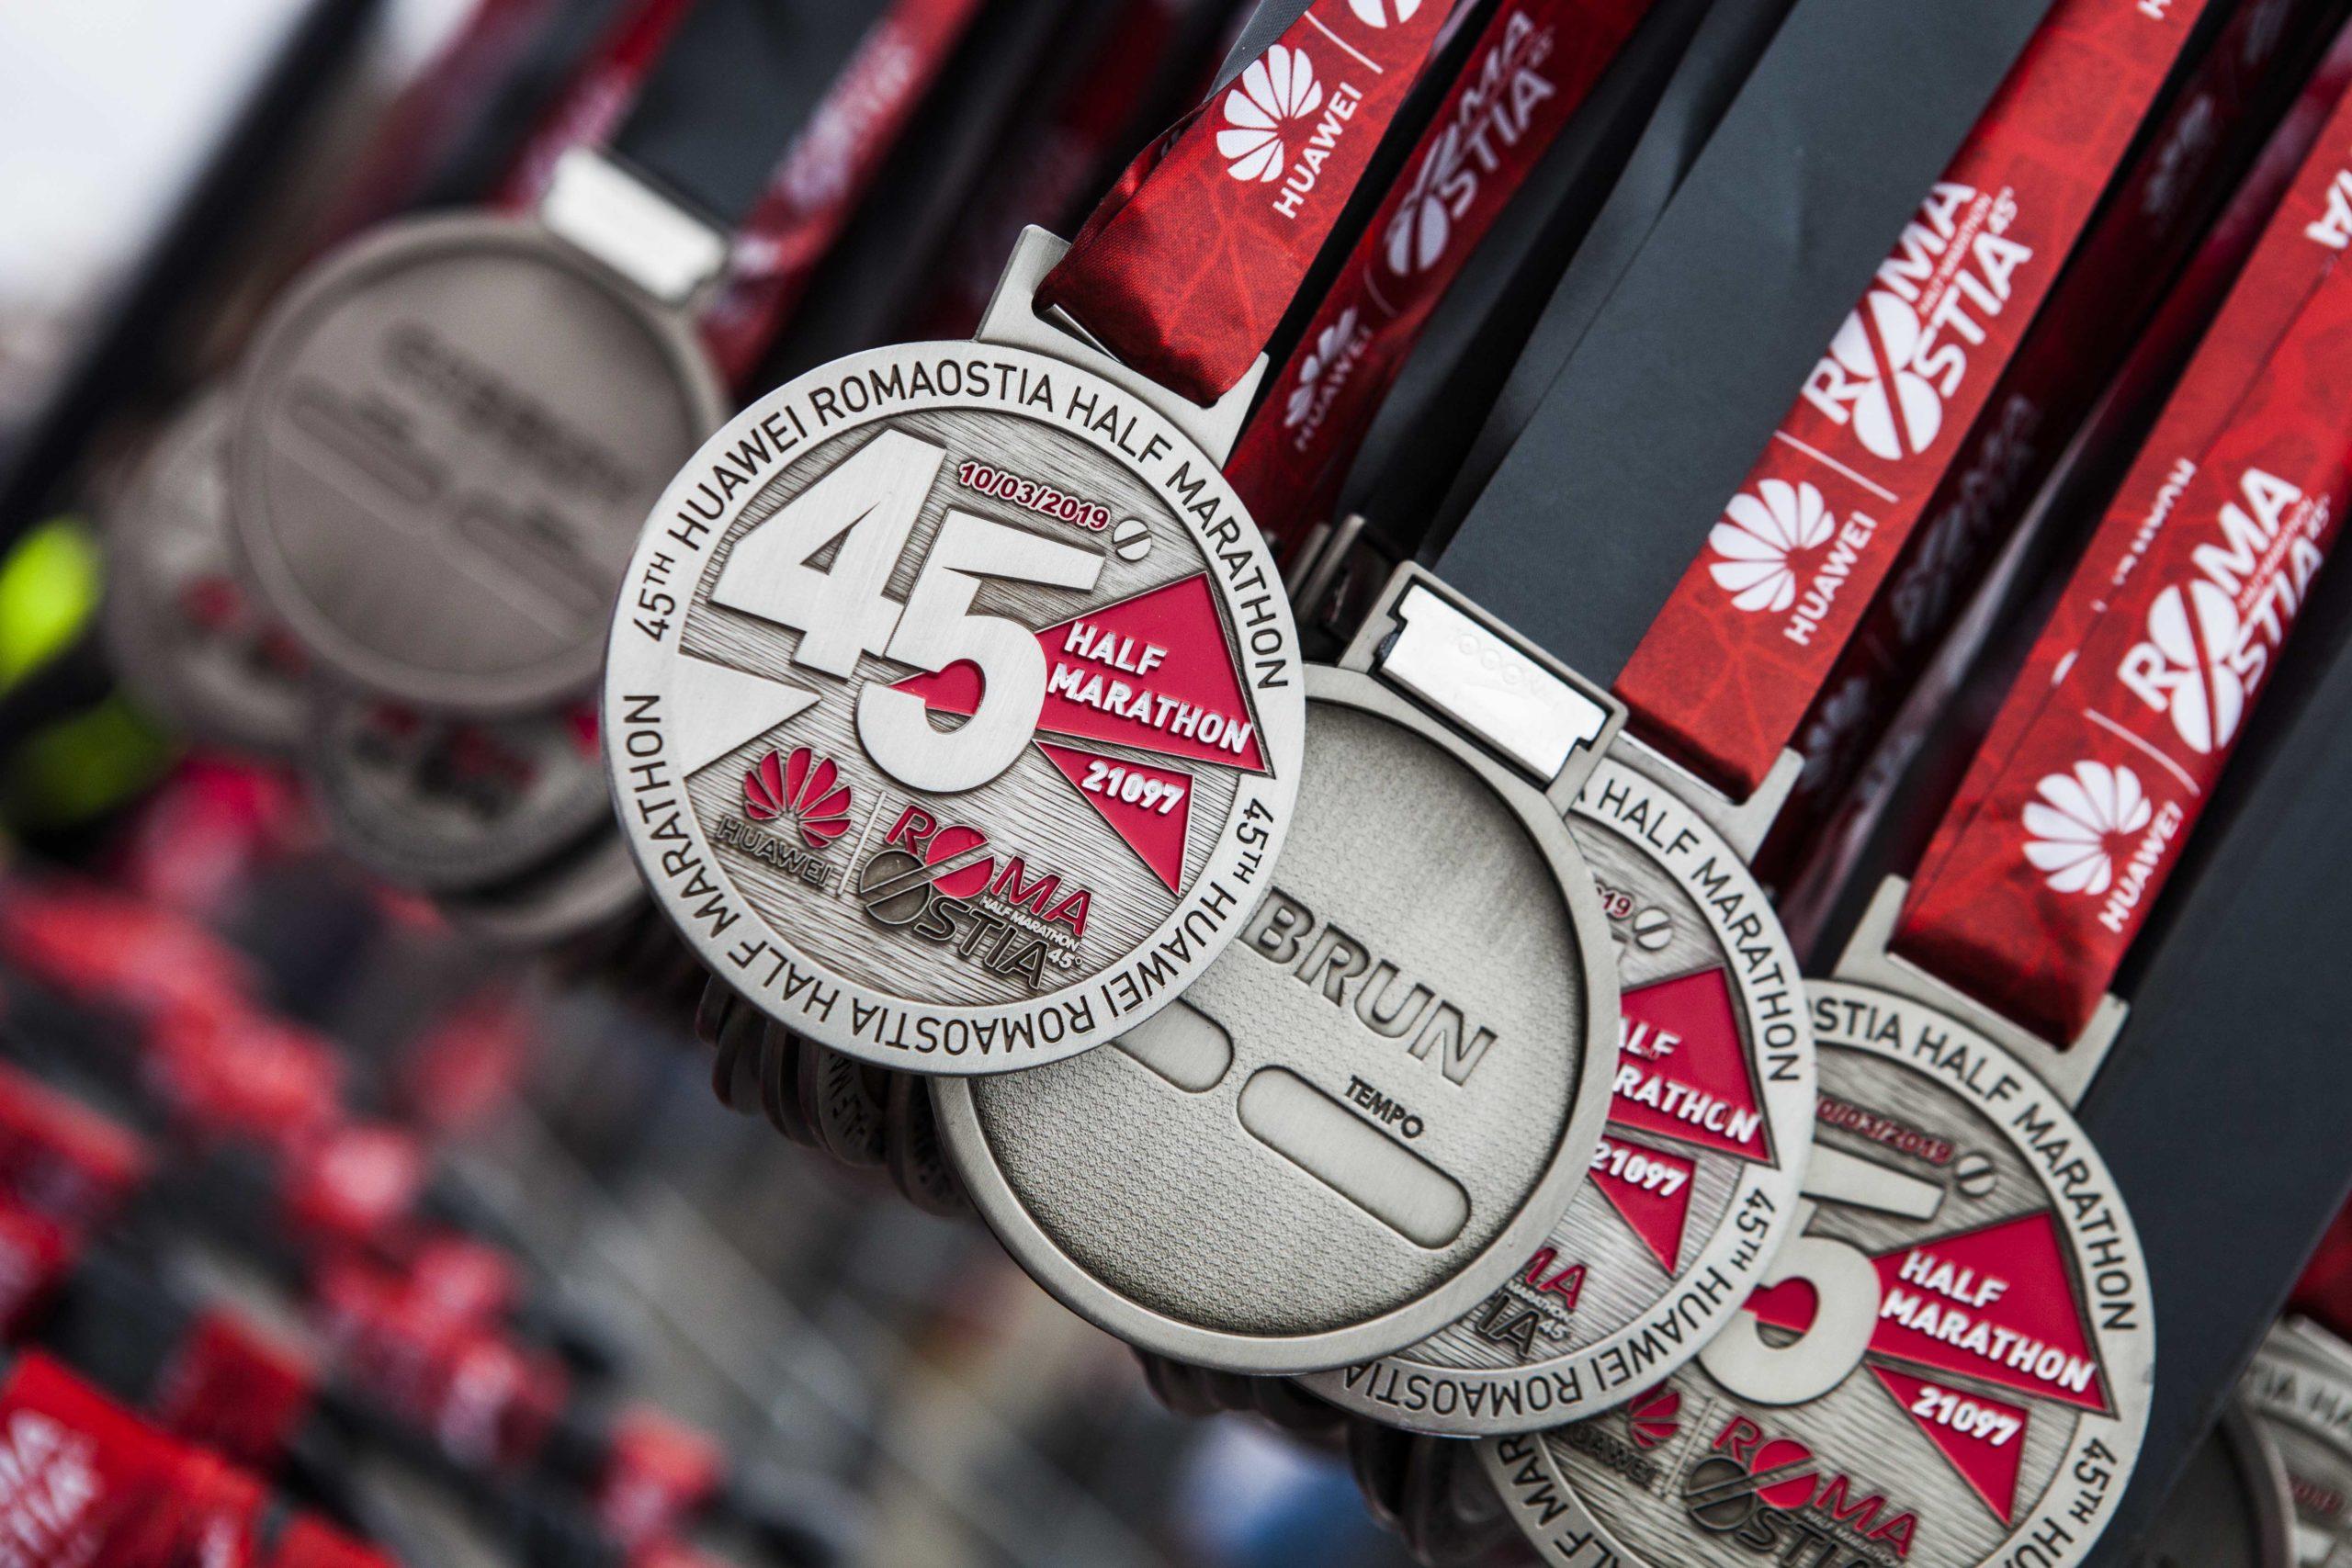 Medaglie e premi huawei marathon